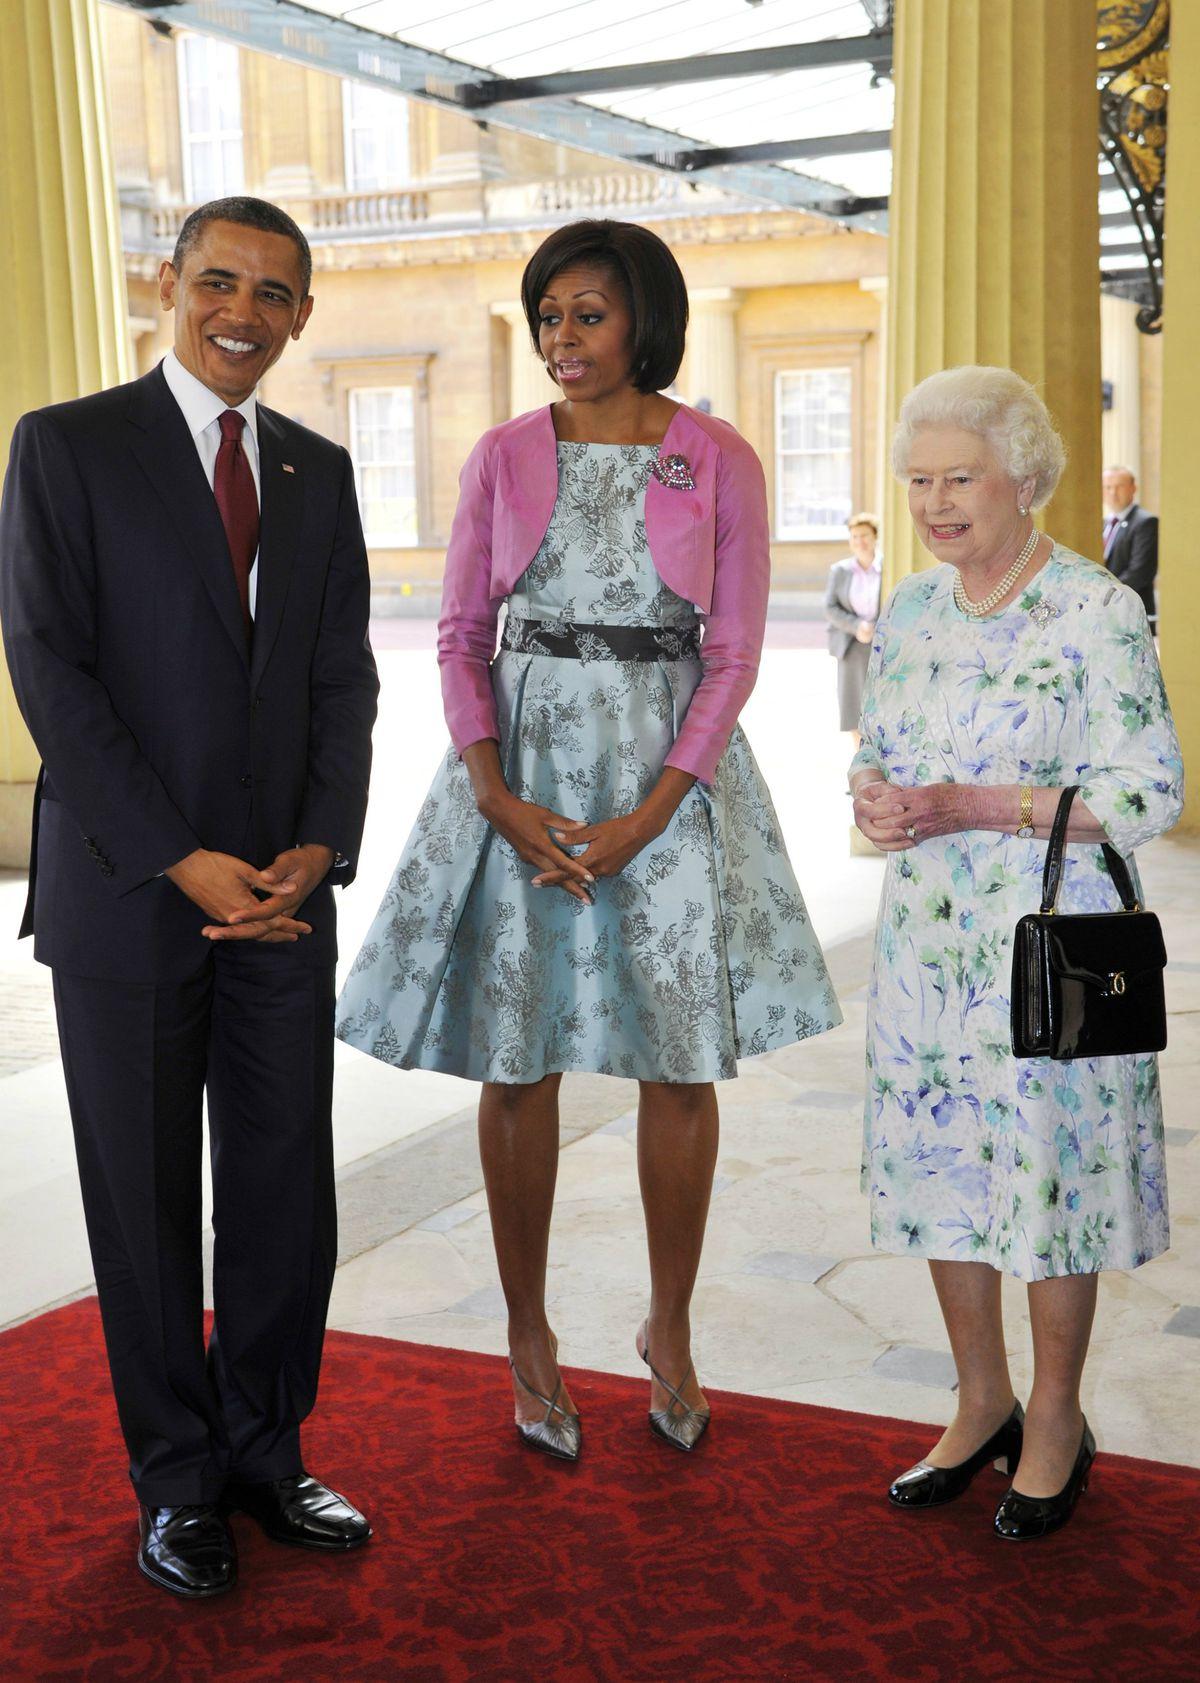 Michelle Obama in a Barbara Tfank dress to meet Queen Elizabeth II in May 2011.